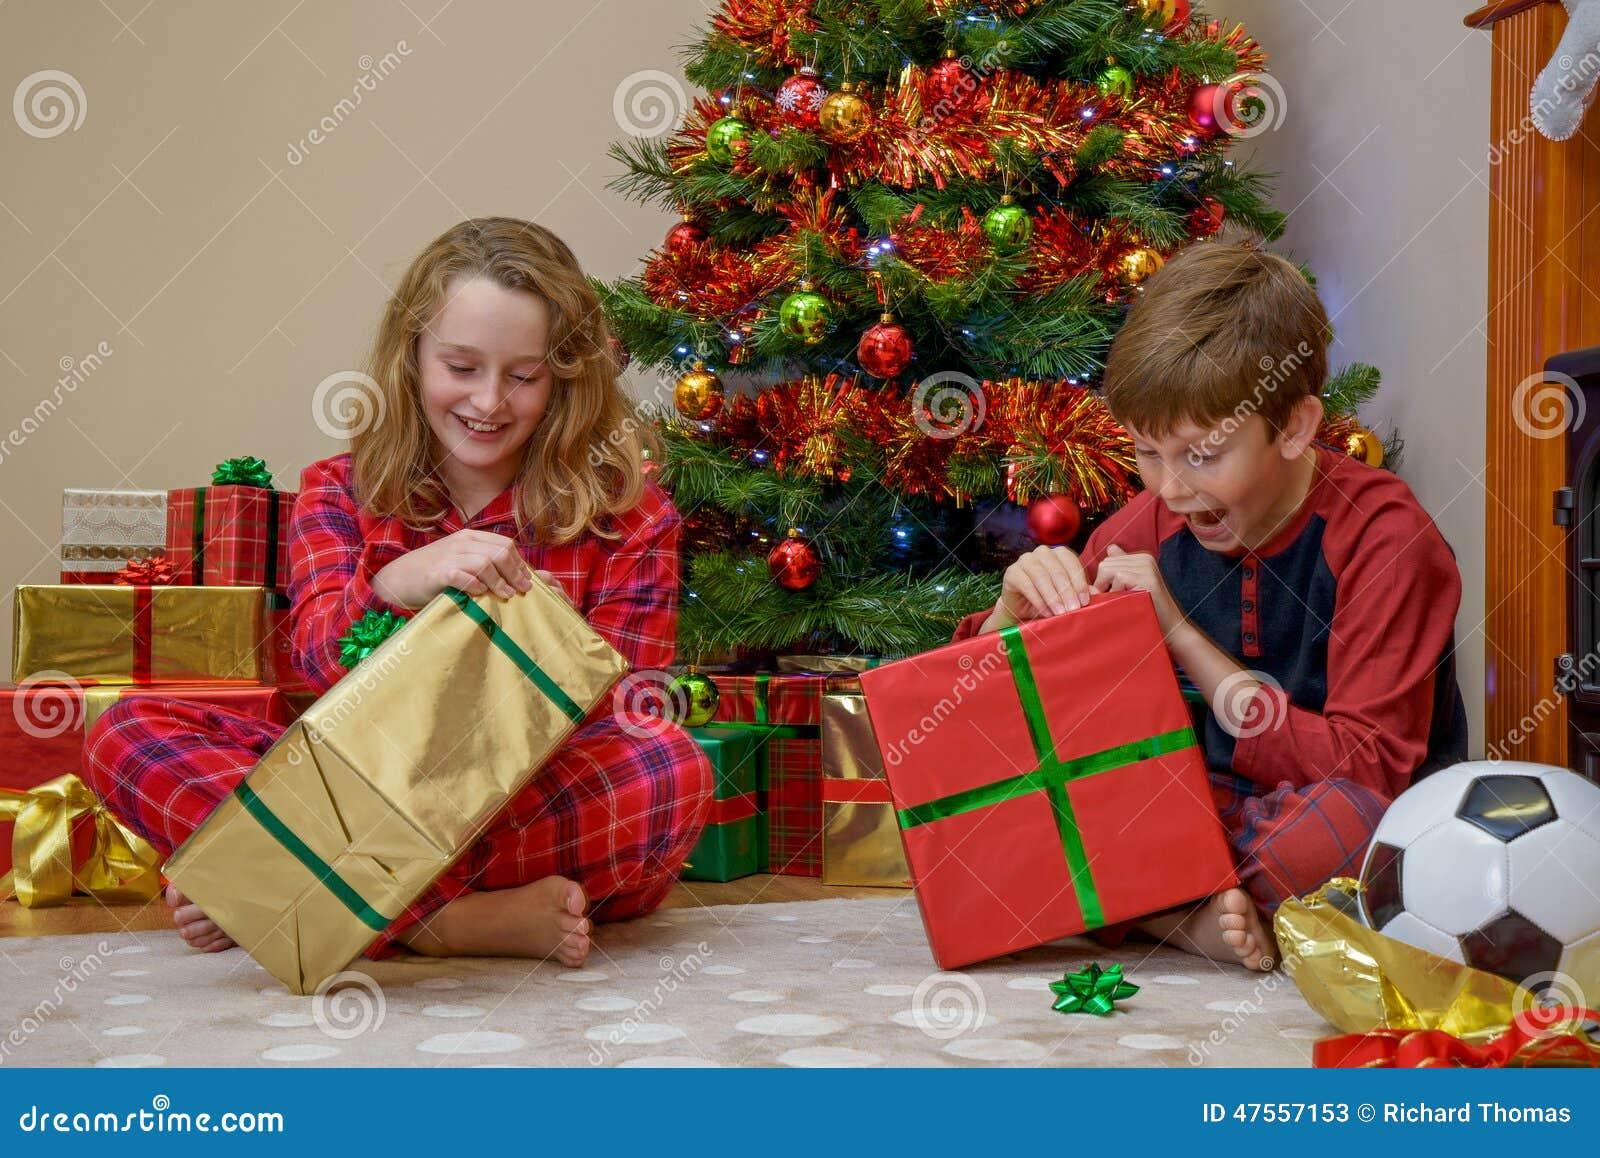 children opening christmas presents